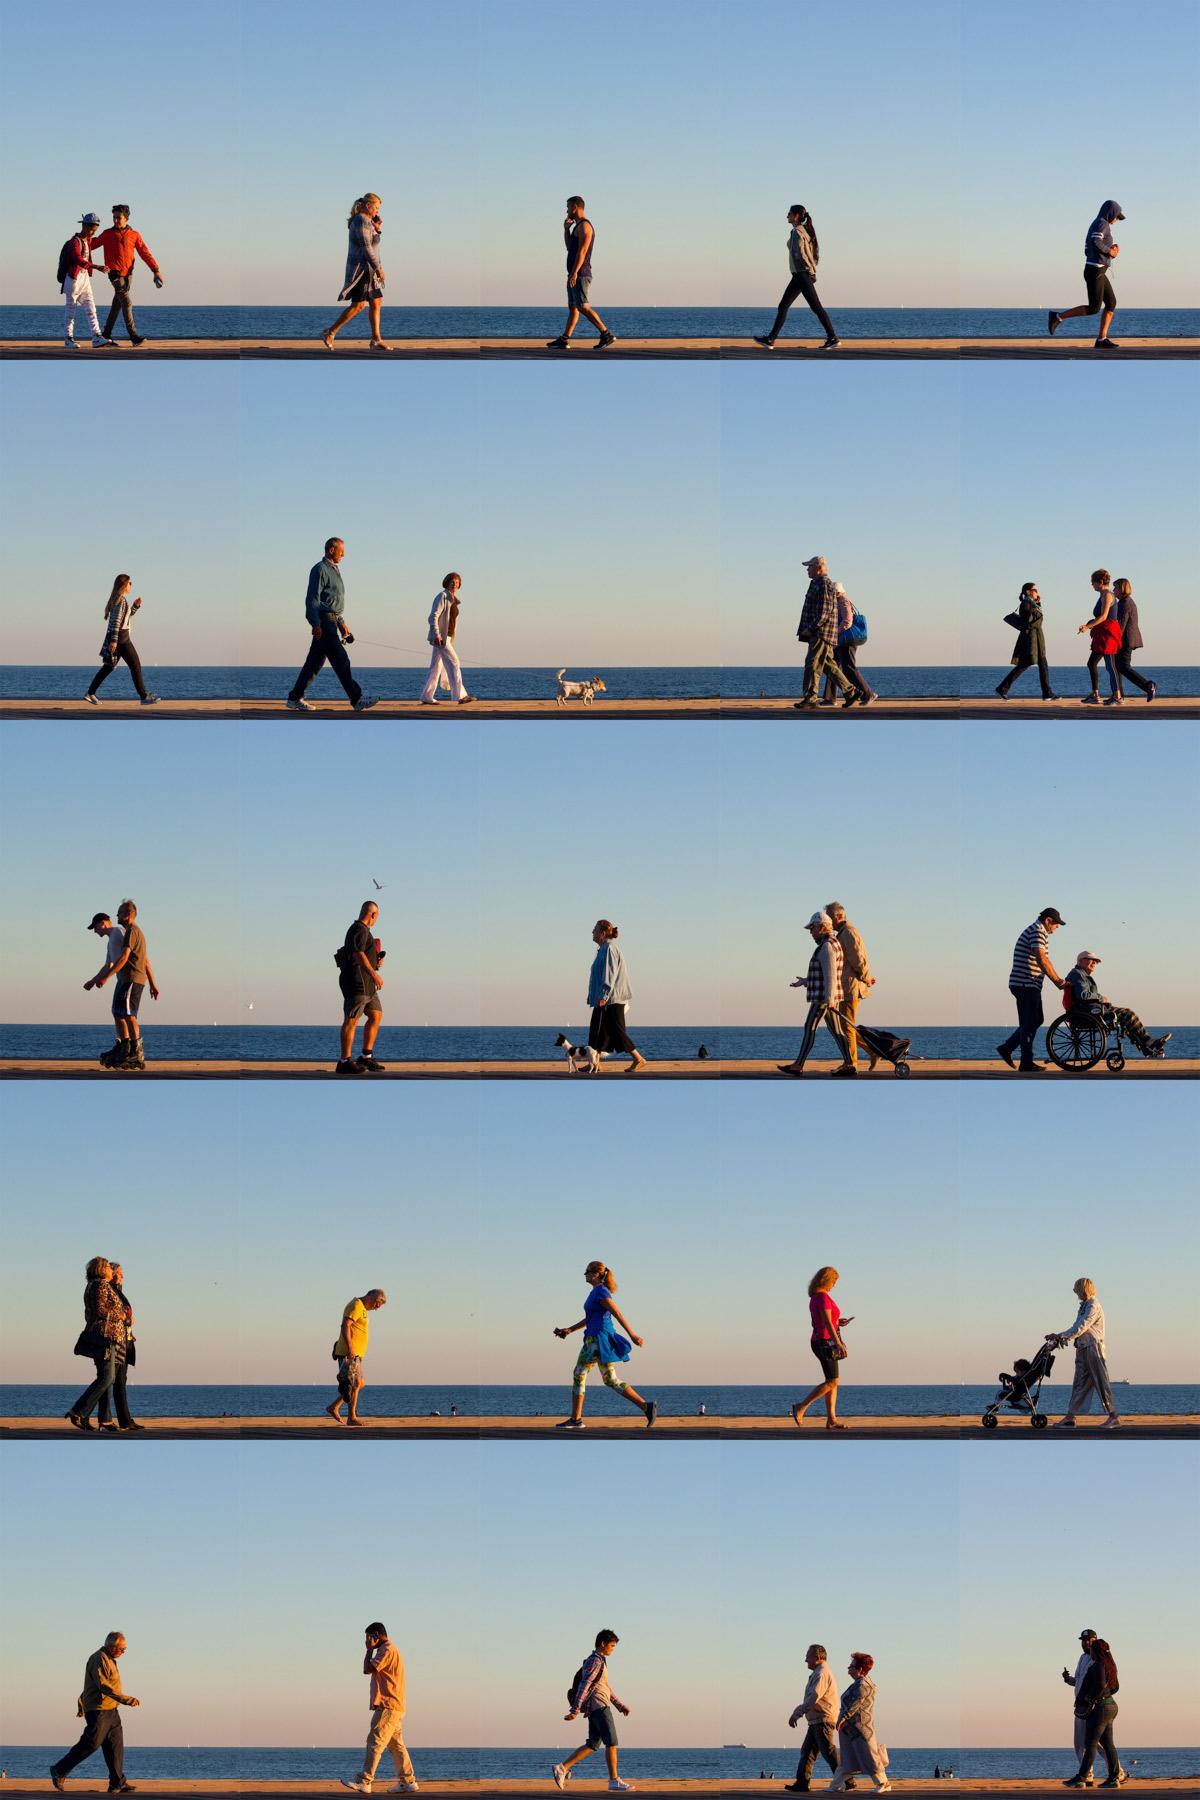 xan-padron---Time-Lapse,-Coney-Island.jpg